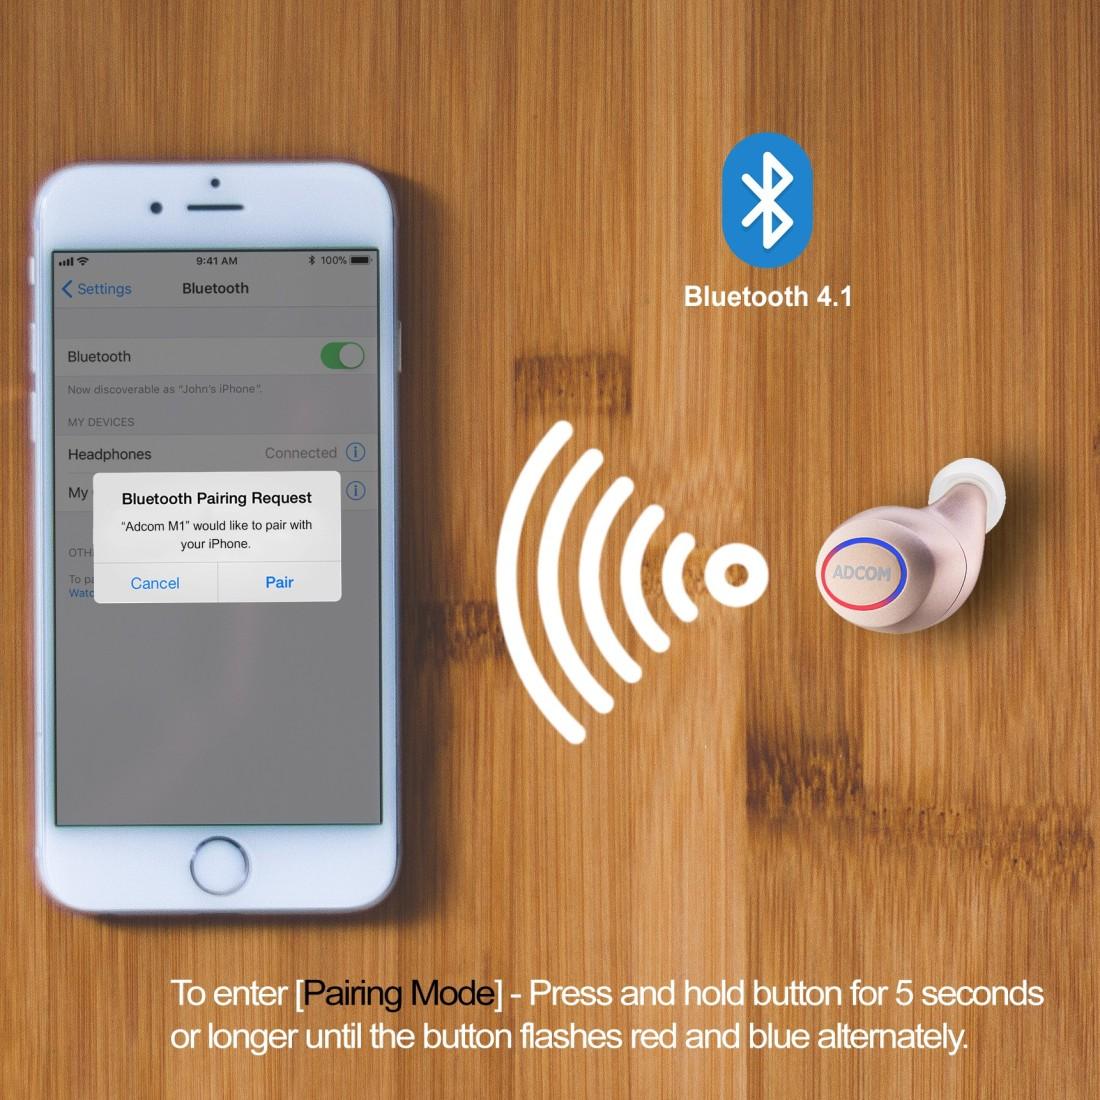 Adcom M1 Wireless Bluetooth Mini Earbuds Bluetooth Headset Price In India Buy Adcom M1 Wireless Bluetooth Mini Earbuds Bluetooth Headset Online Adcom Flipkart Com